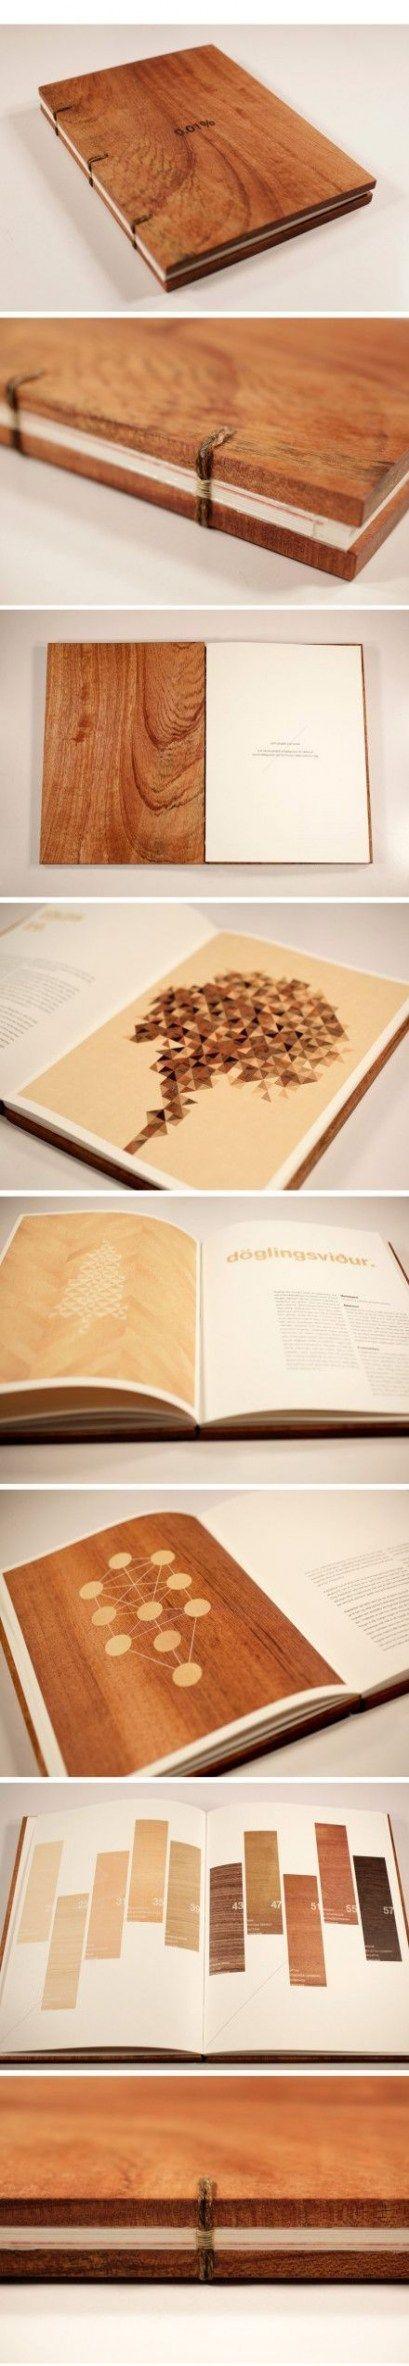 51 Ideas For Book Cover Material Simple Bookbinding Book Binding Book Design